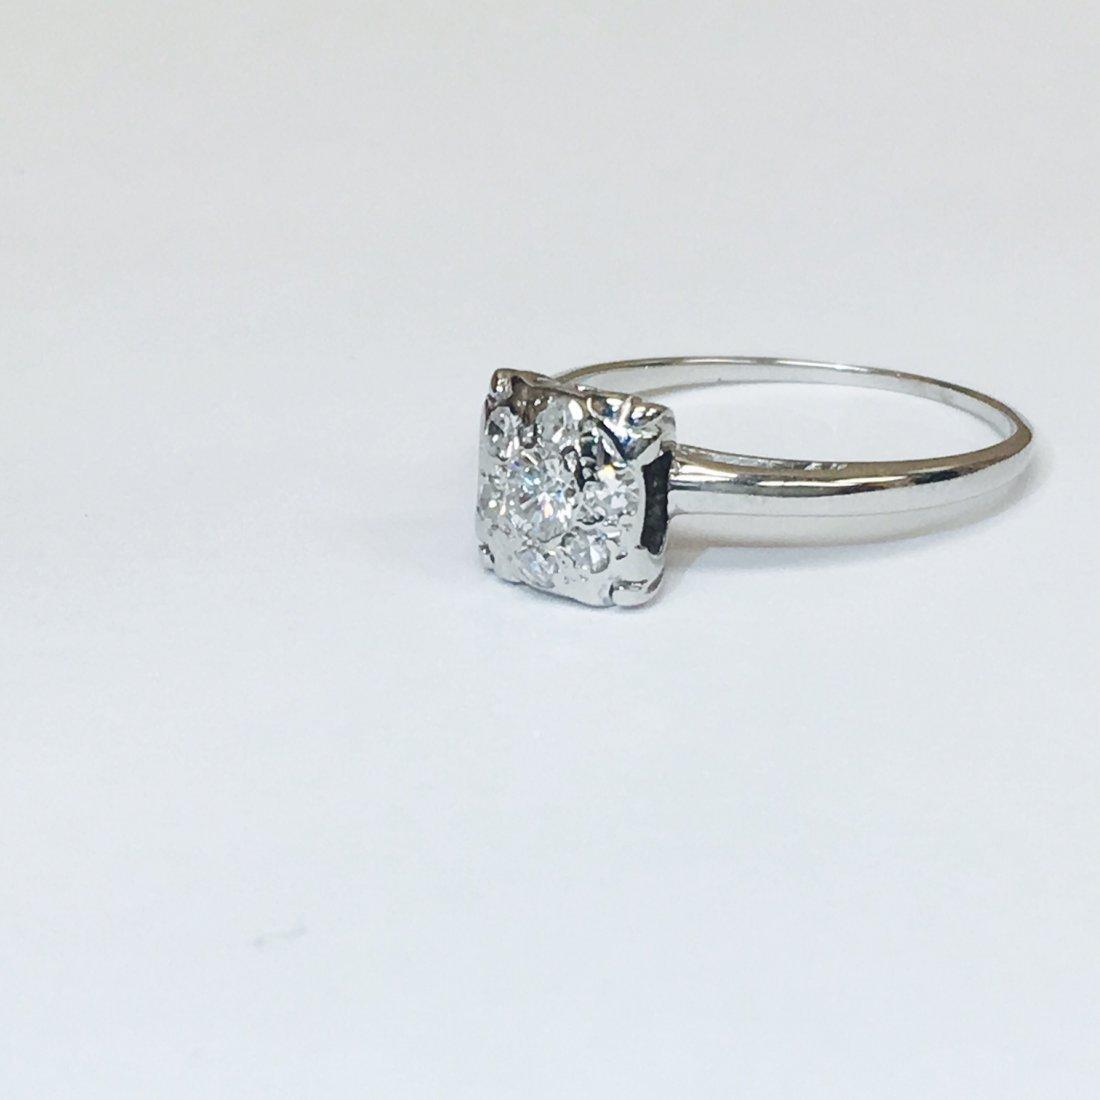 14K White Gold, VVS Clarity Diamond Ring - 3